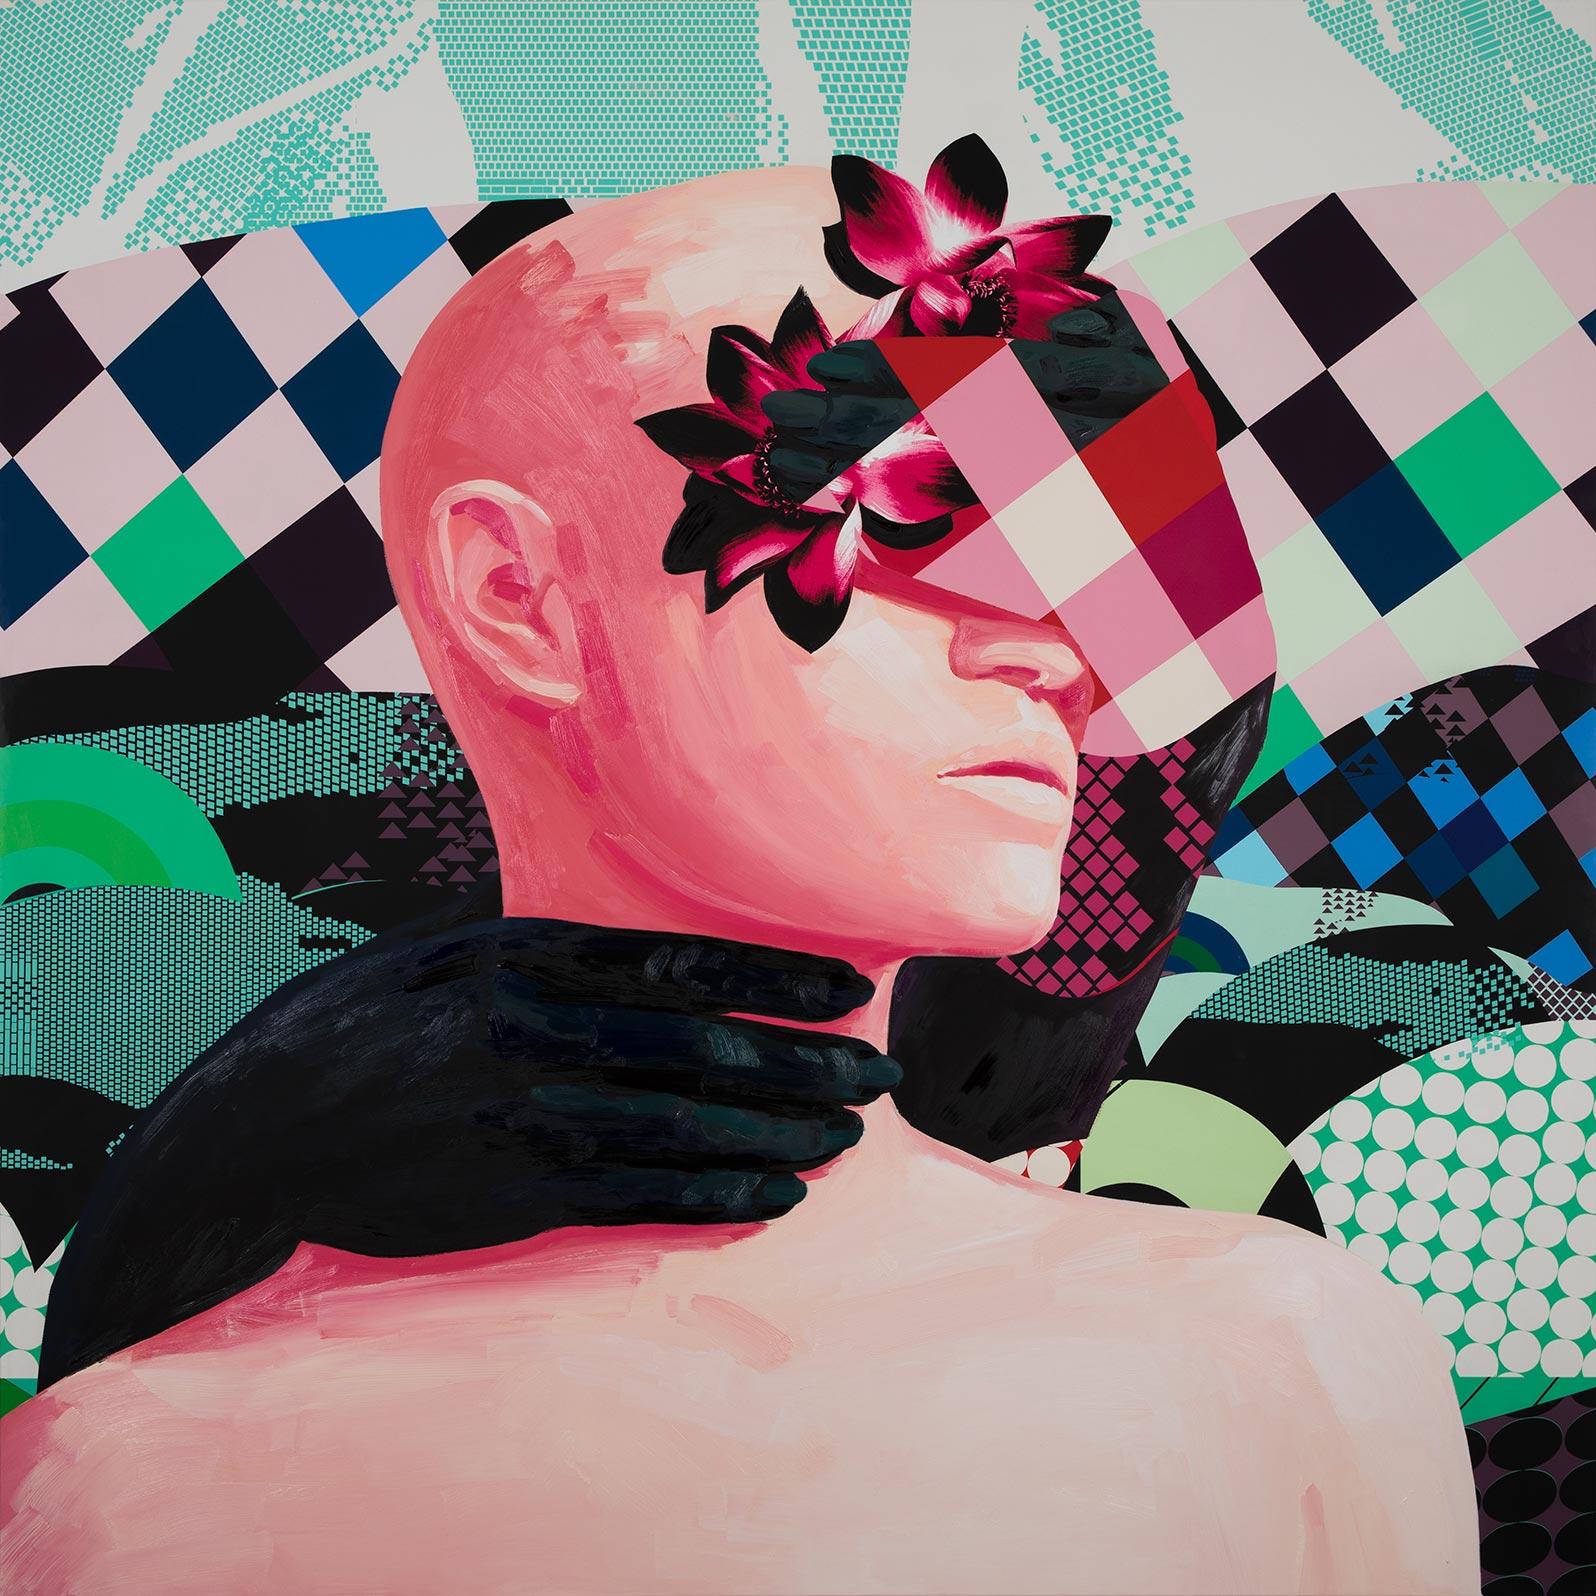 Anca Stefanescu | Mixed Media | OpeningToChannel, Modern Art Paintings